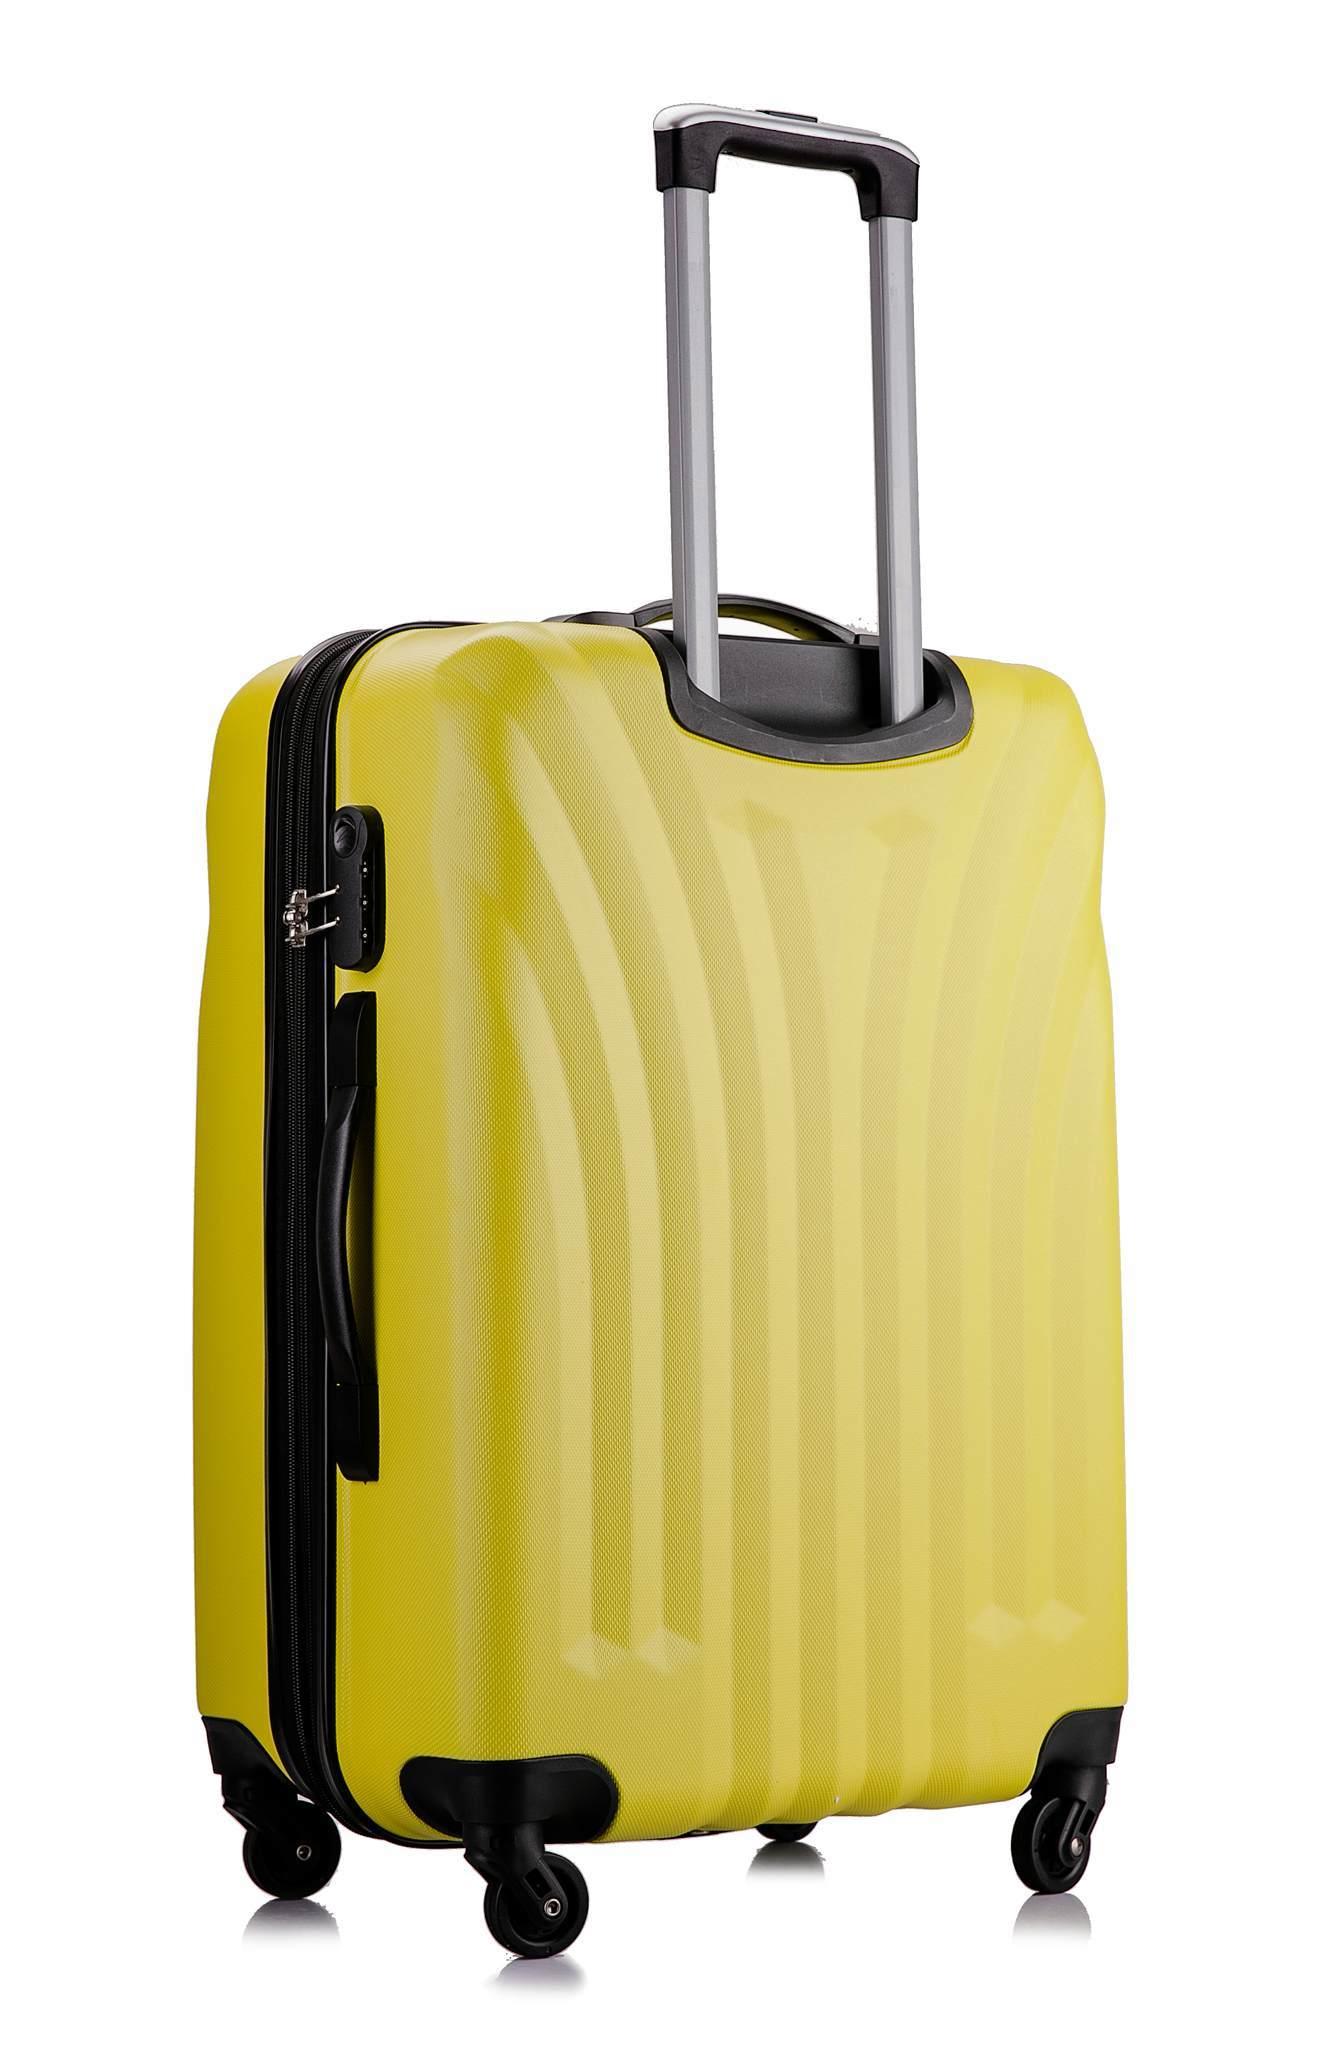 Чемодан с расширением L'case Phuket-28 Желтый (XL)